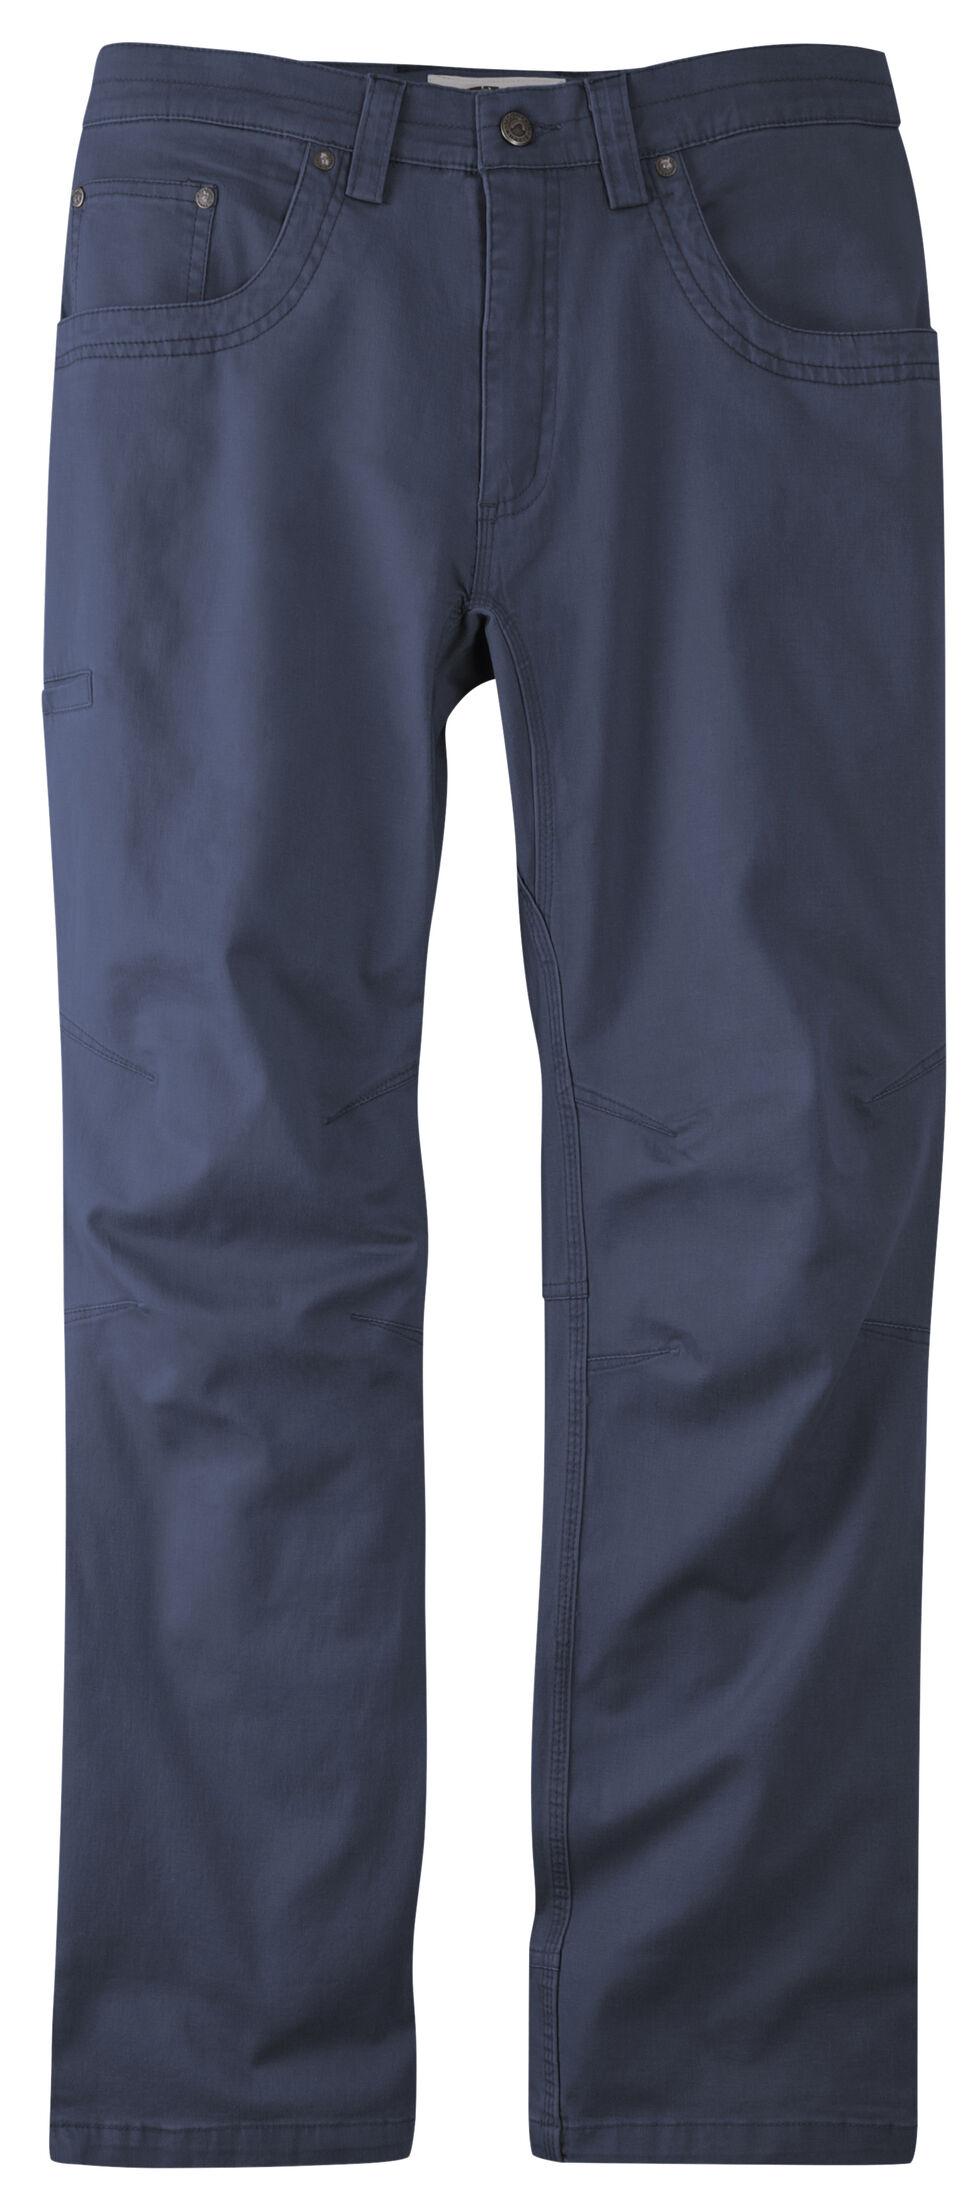 Mountain Khakis Men's Navy Camber 105 Classic Fit Pants , Navy, hi-res